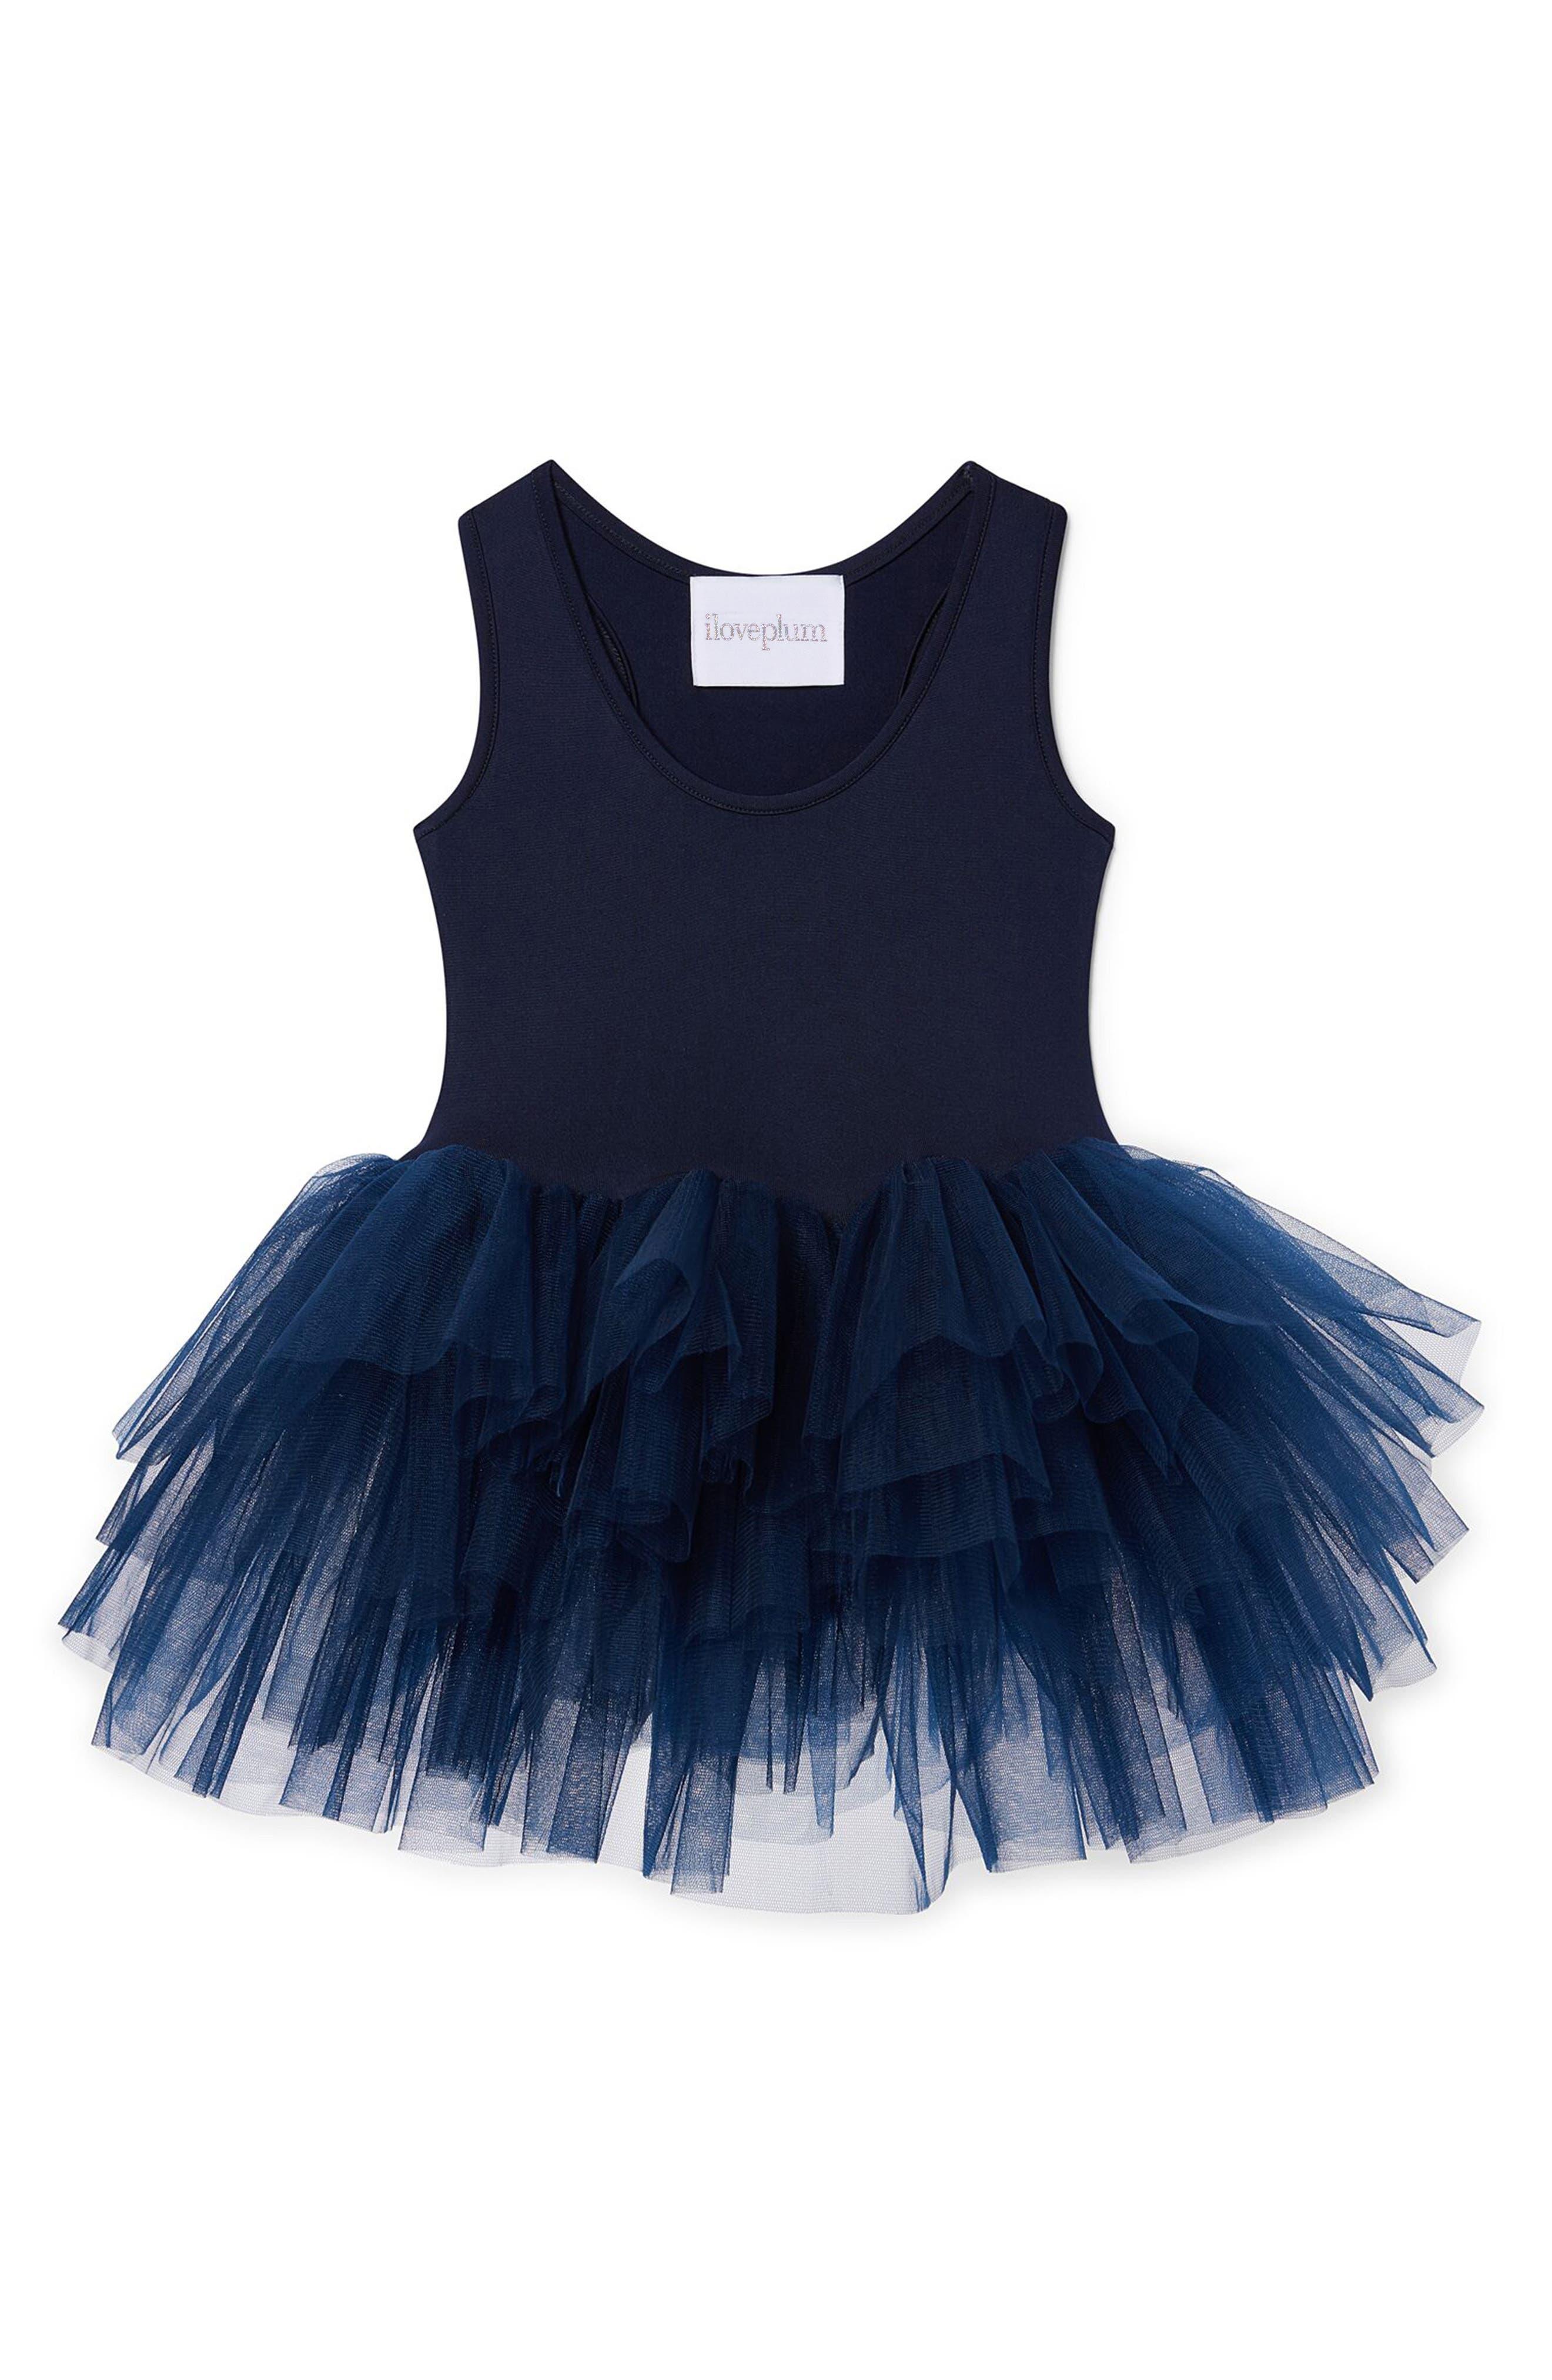 Tutu Dress,                             Main thumbnail 1, color,                             Navy Blue